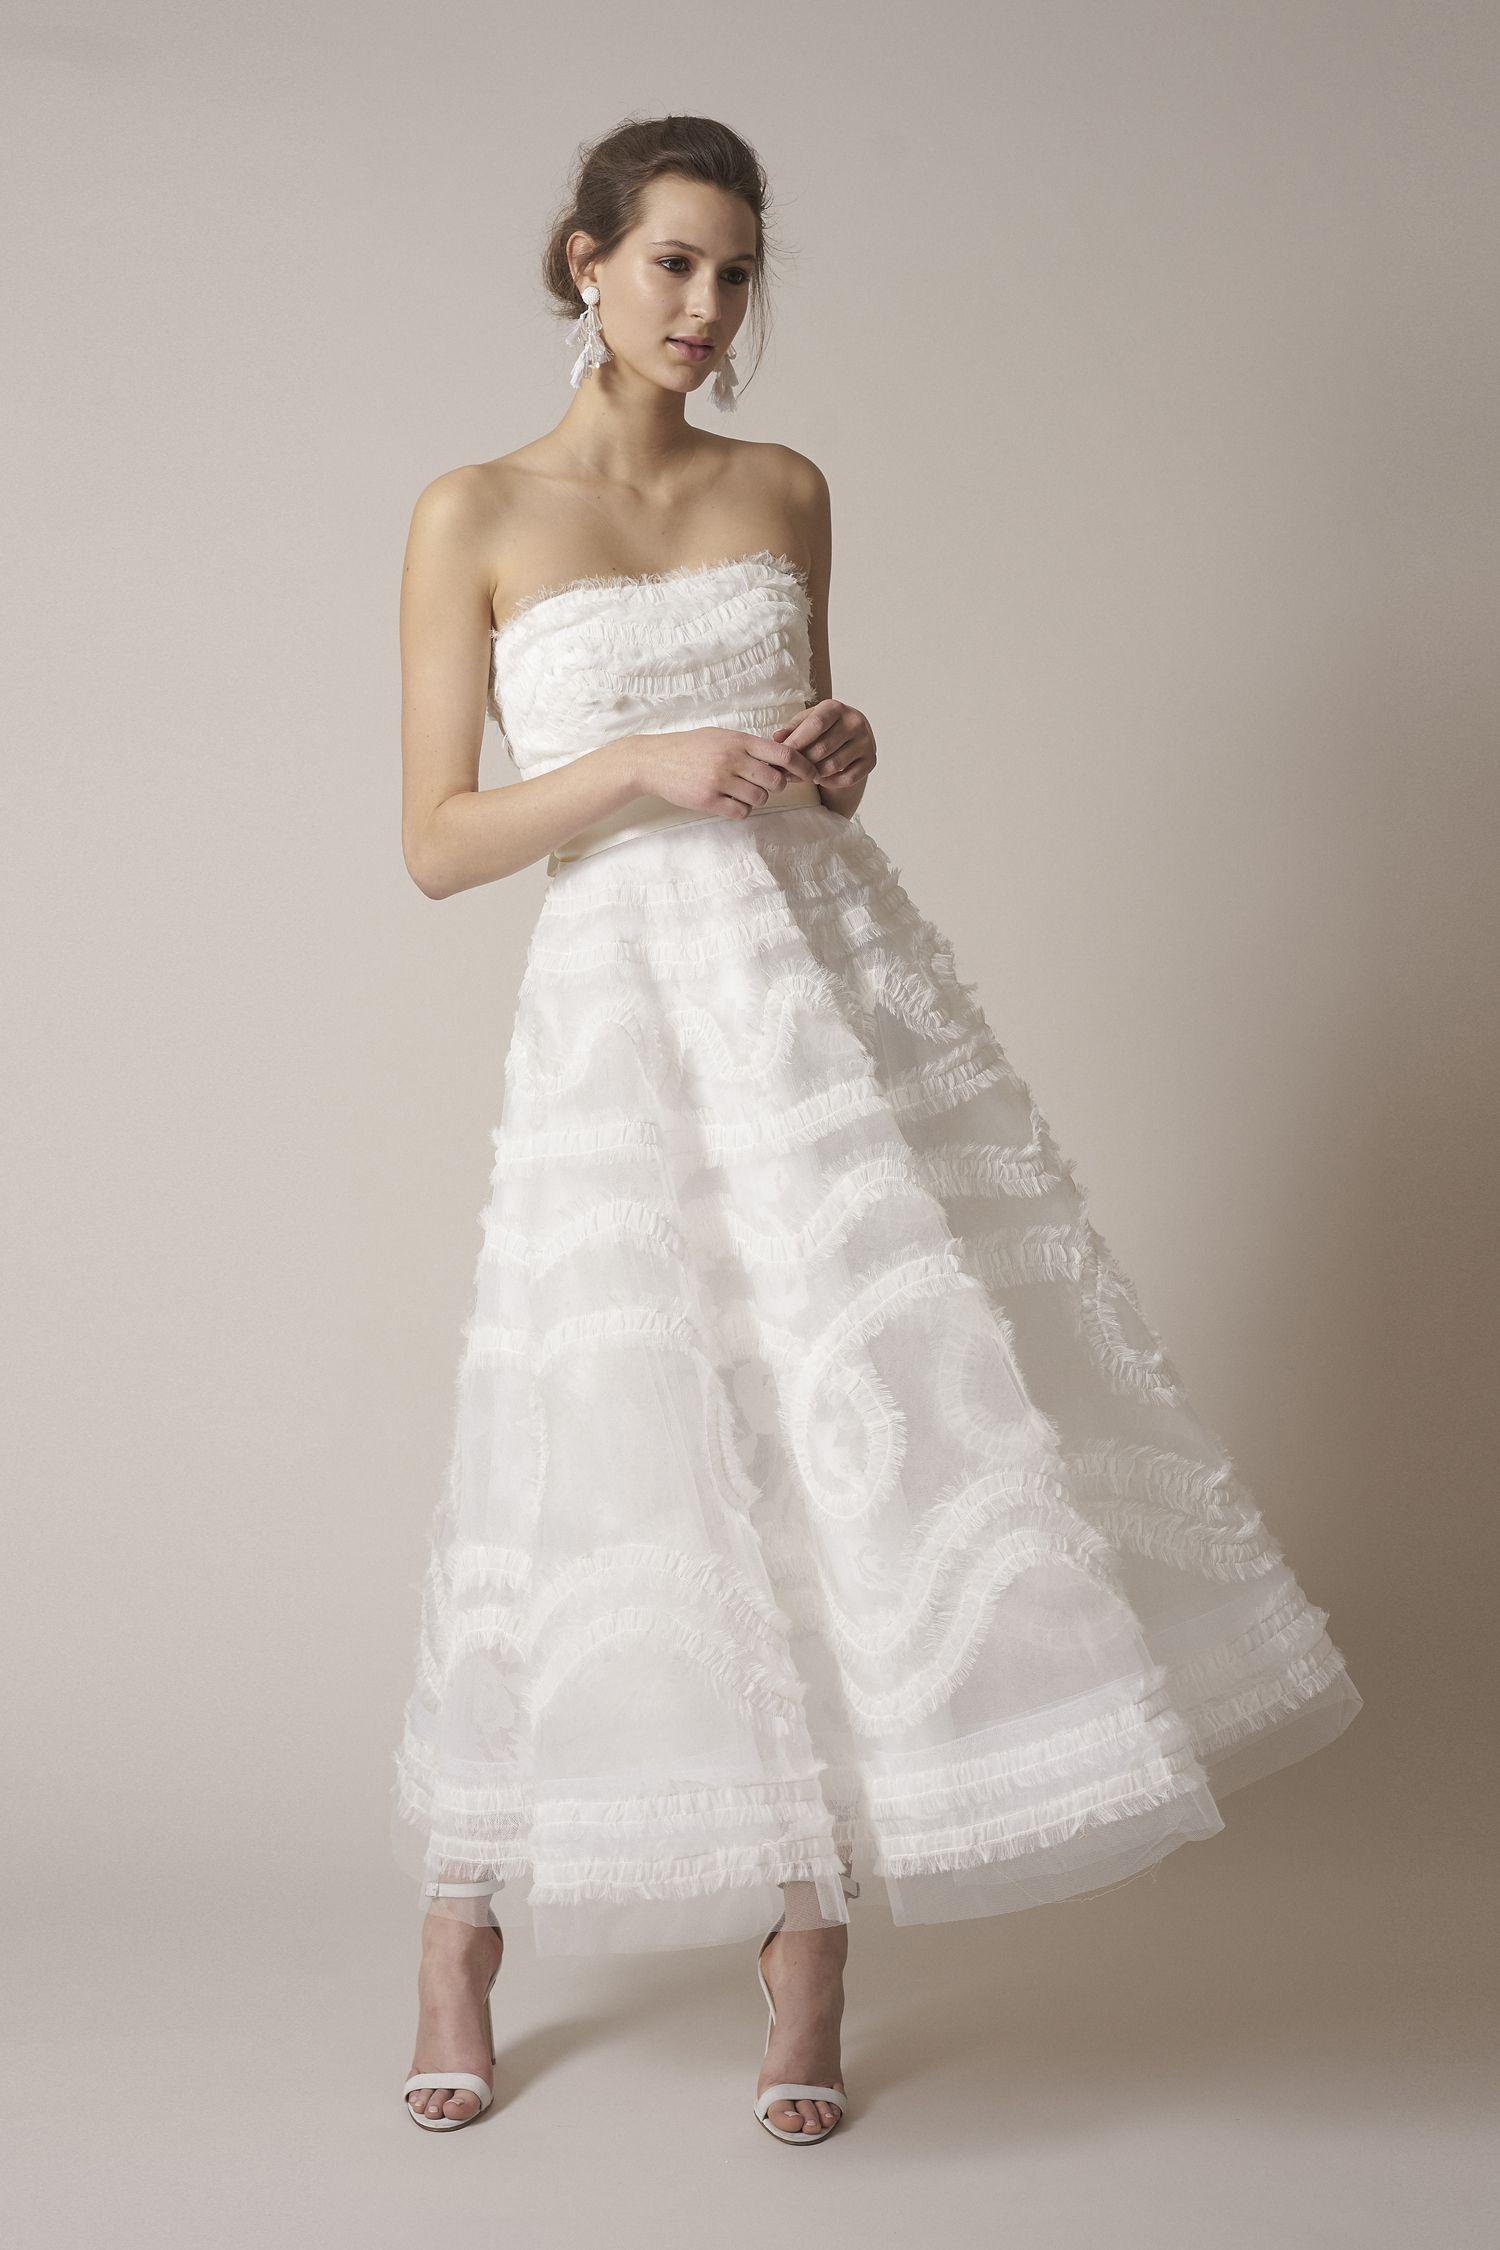 M O Bridal & Wedding Crinkle Chiffon Midi Gown from Sachin & Babi